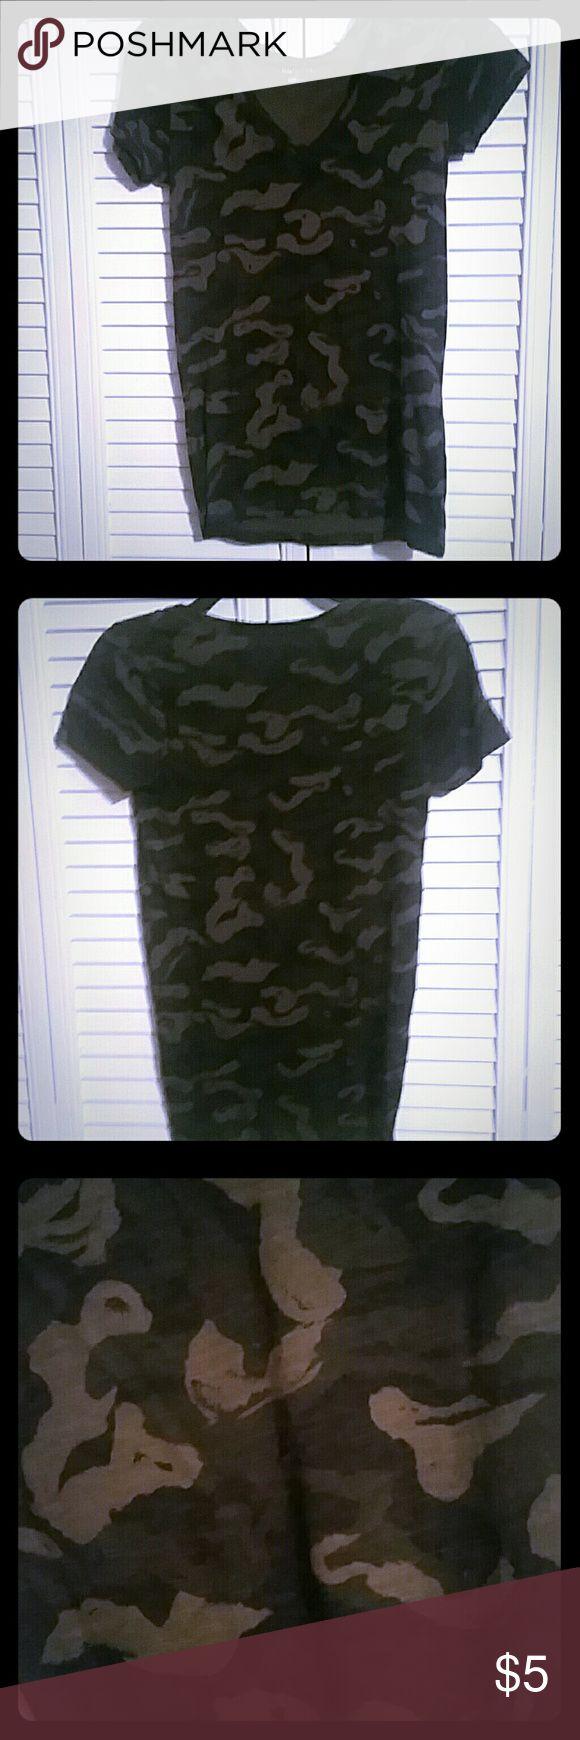 Camo Tee Shirt Merona Camo Print V neck tee shirt Tops Tees - Short Sleeve